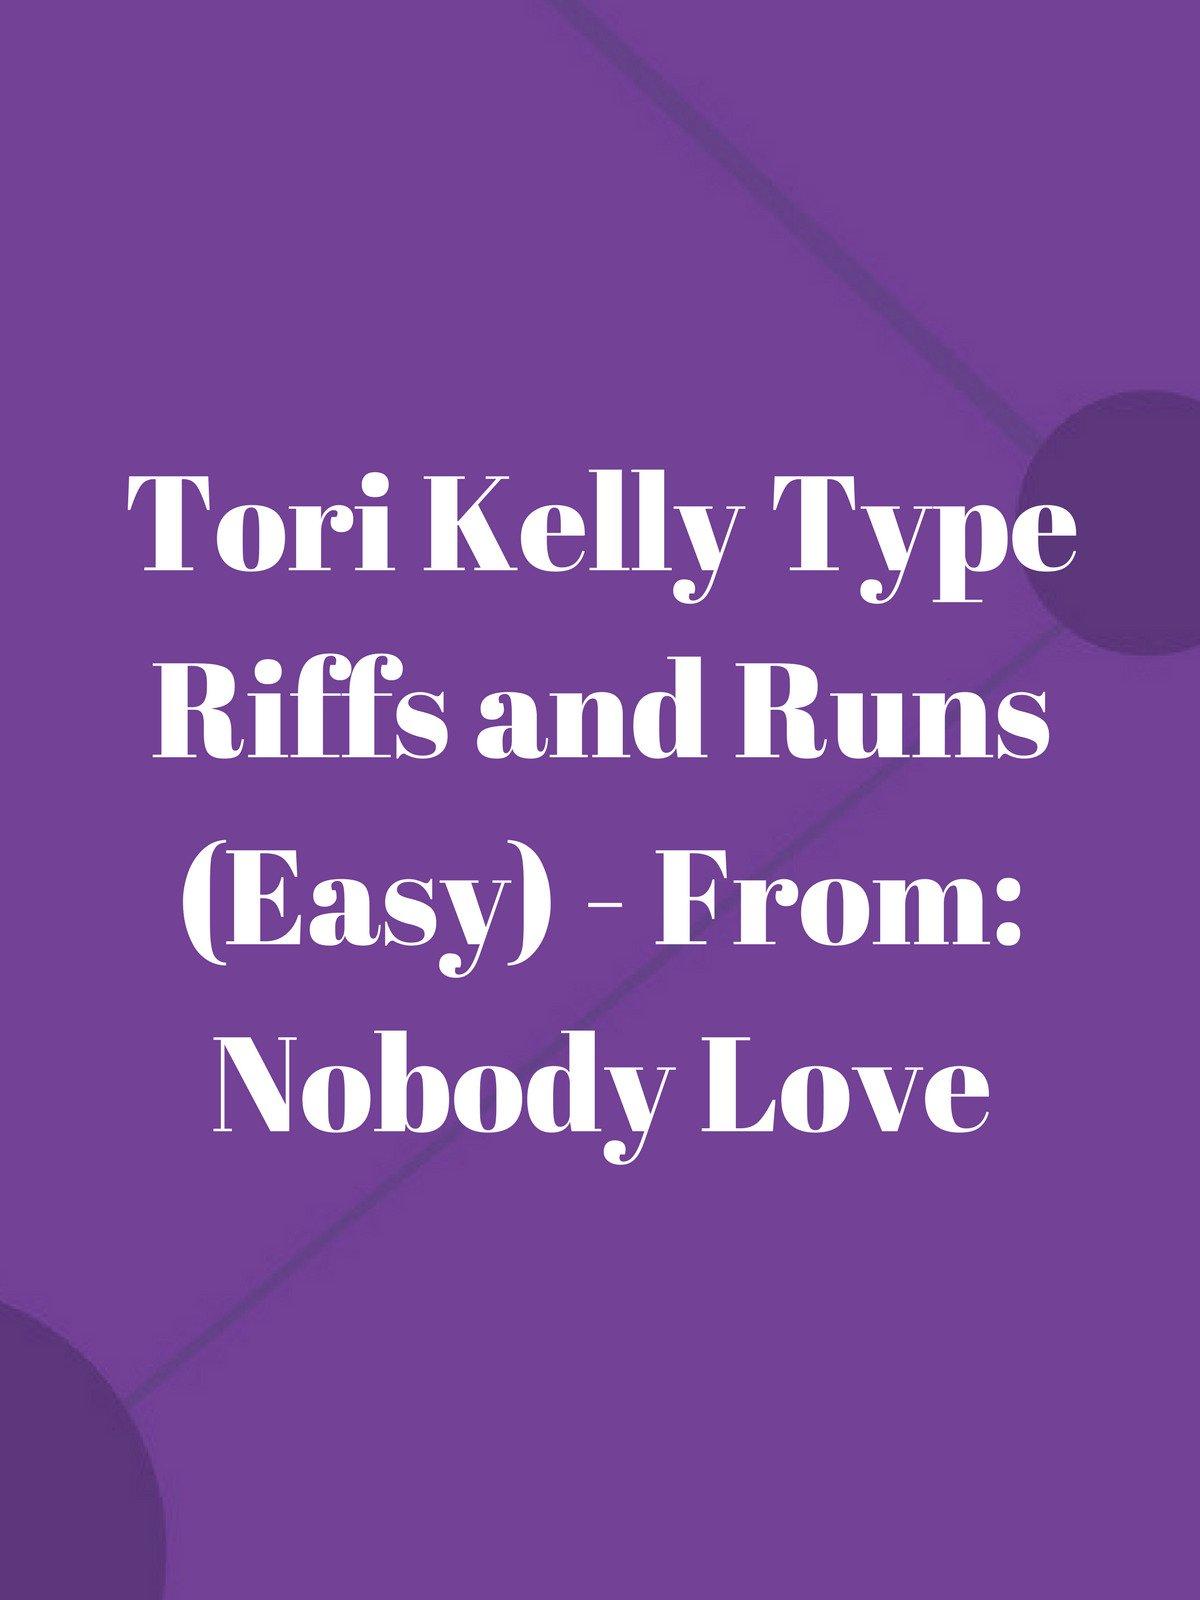 Tori Kelly Type Riffs and Runs (Easy)